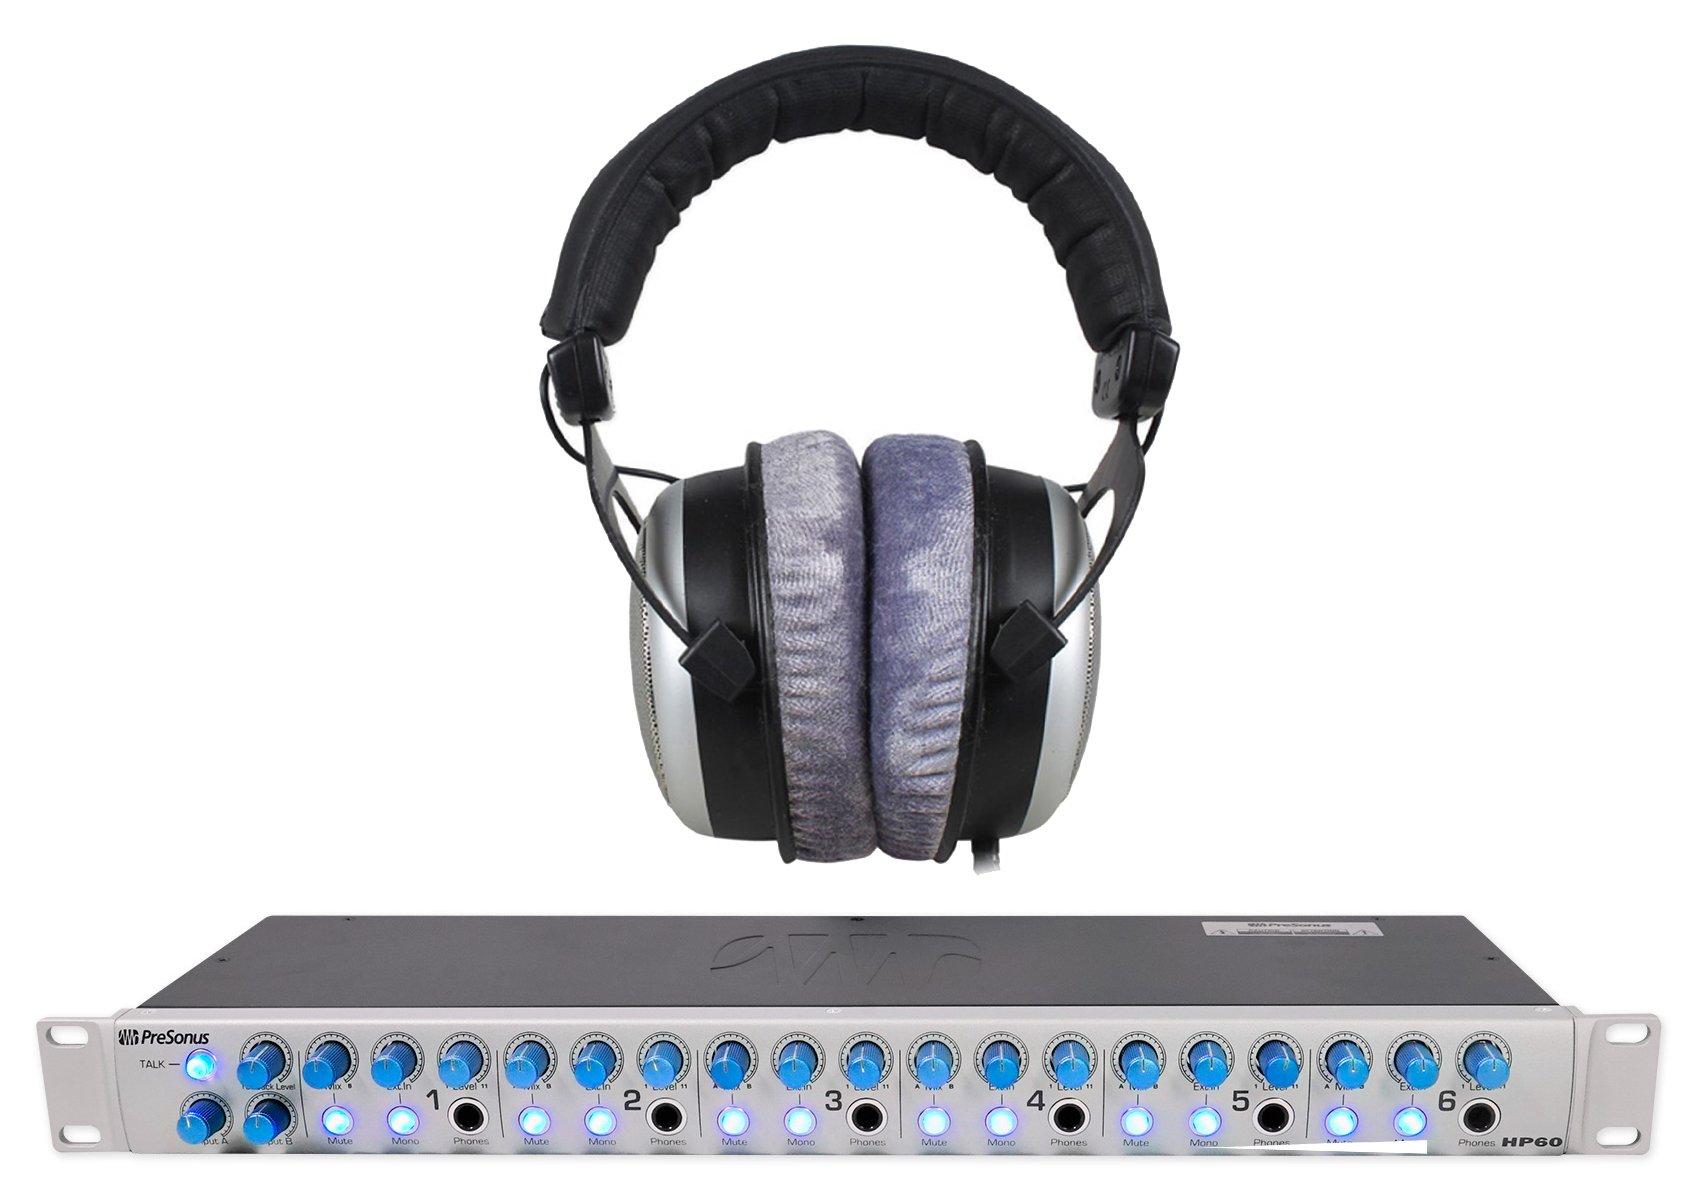 Beyerdynamic DT-880 Pro 250 Ohm +Presonus HP60 6 Channel Headphone Amplifier Amp by beyerdynamic